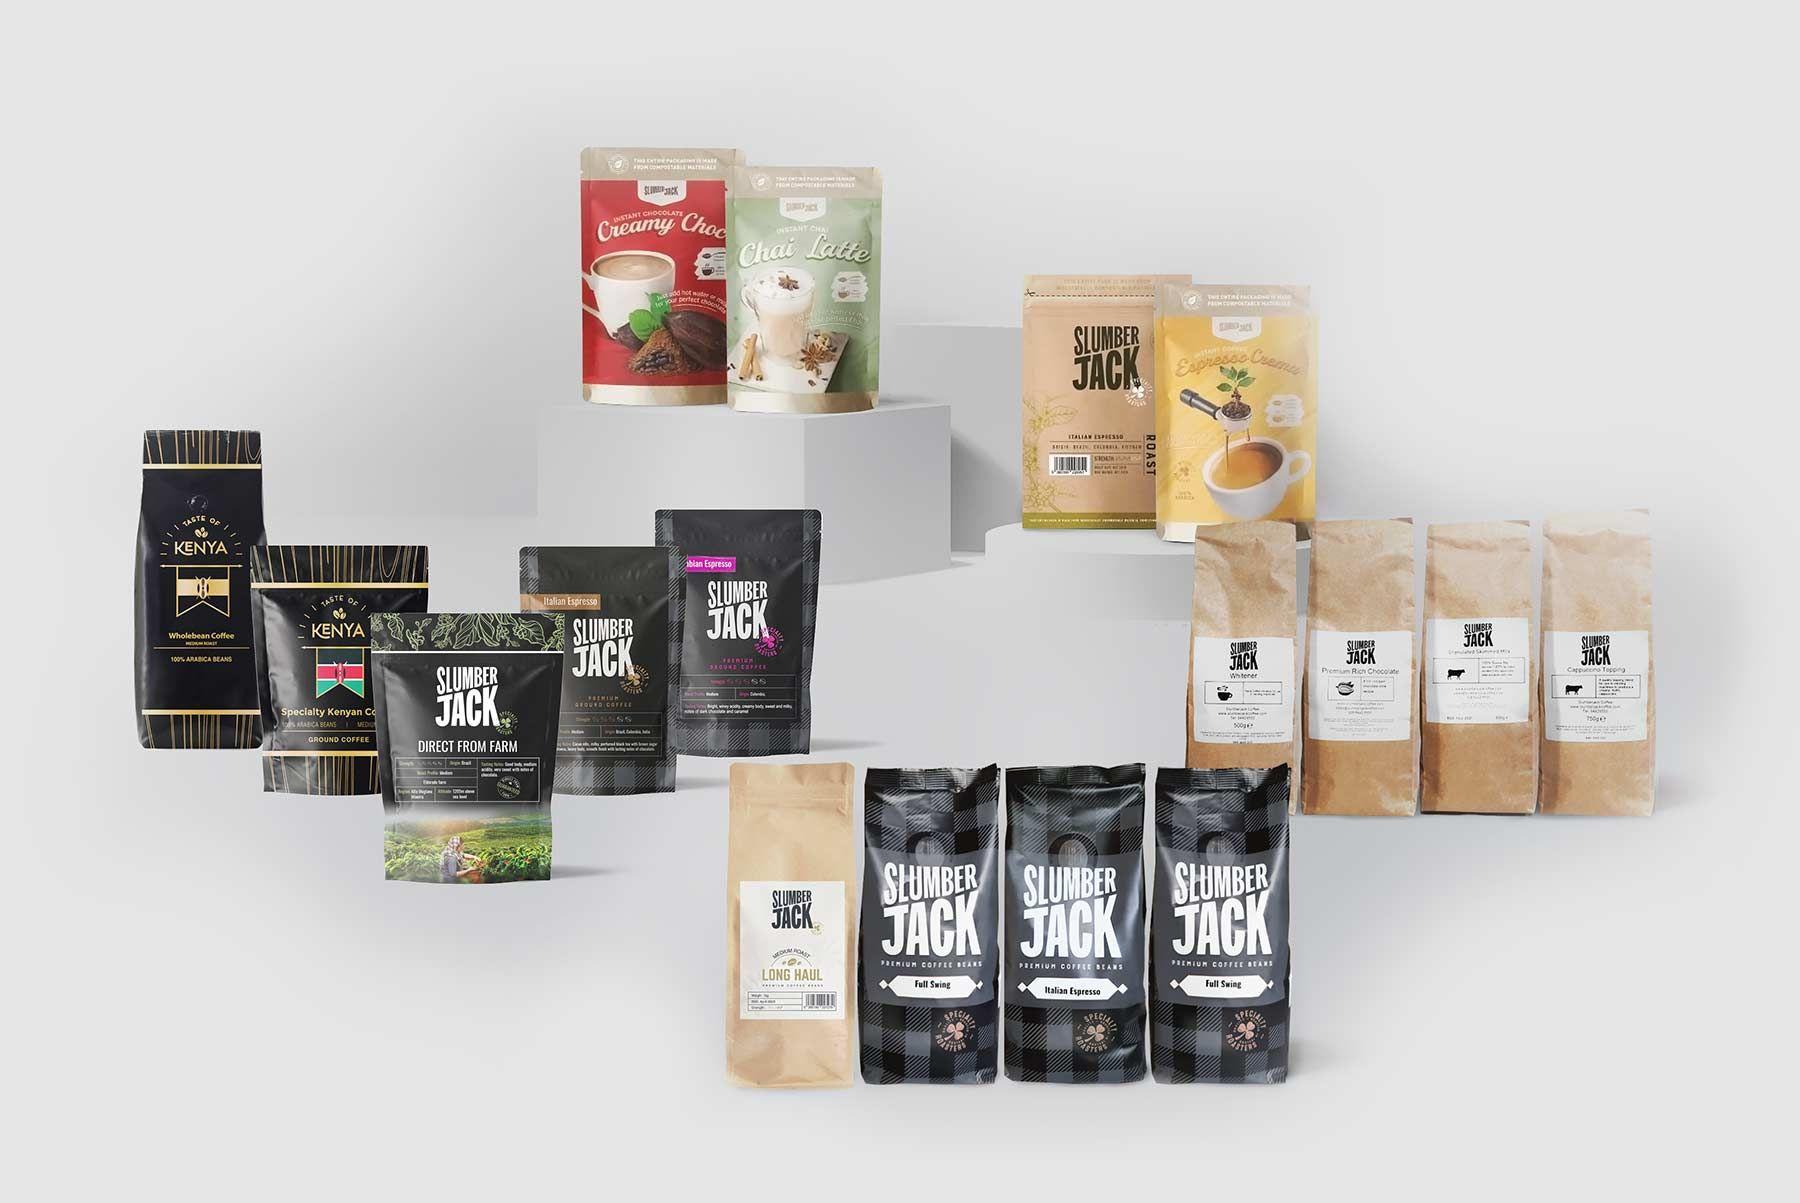 The range of slumberjack products